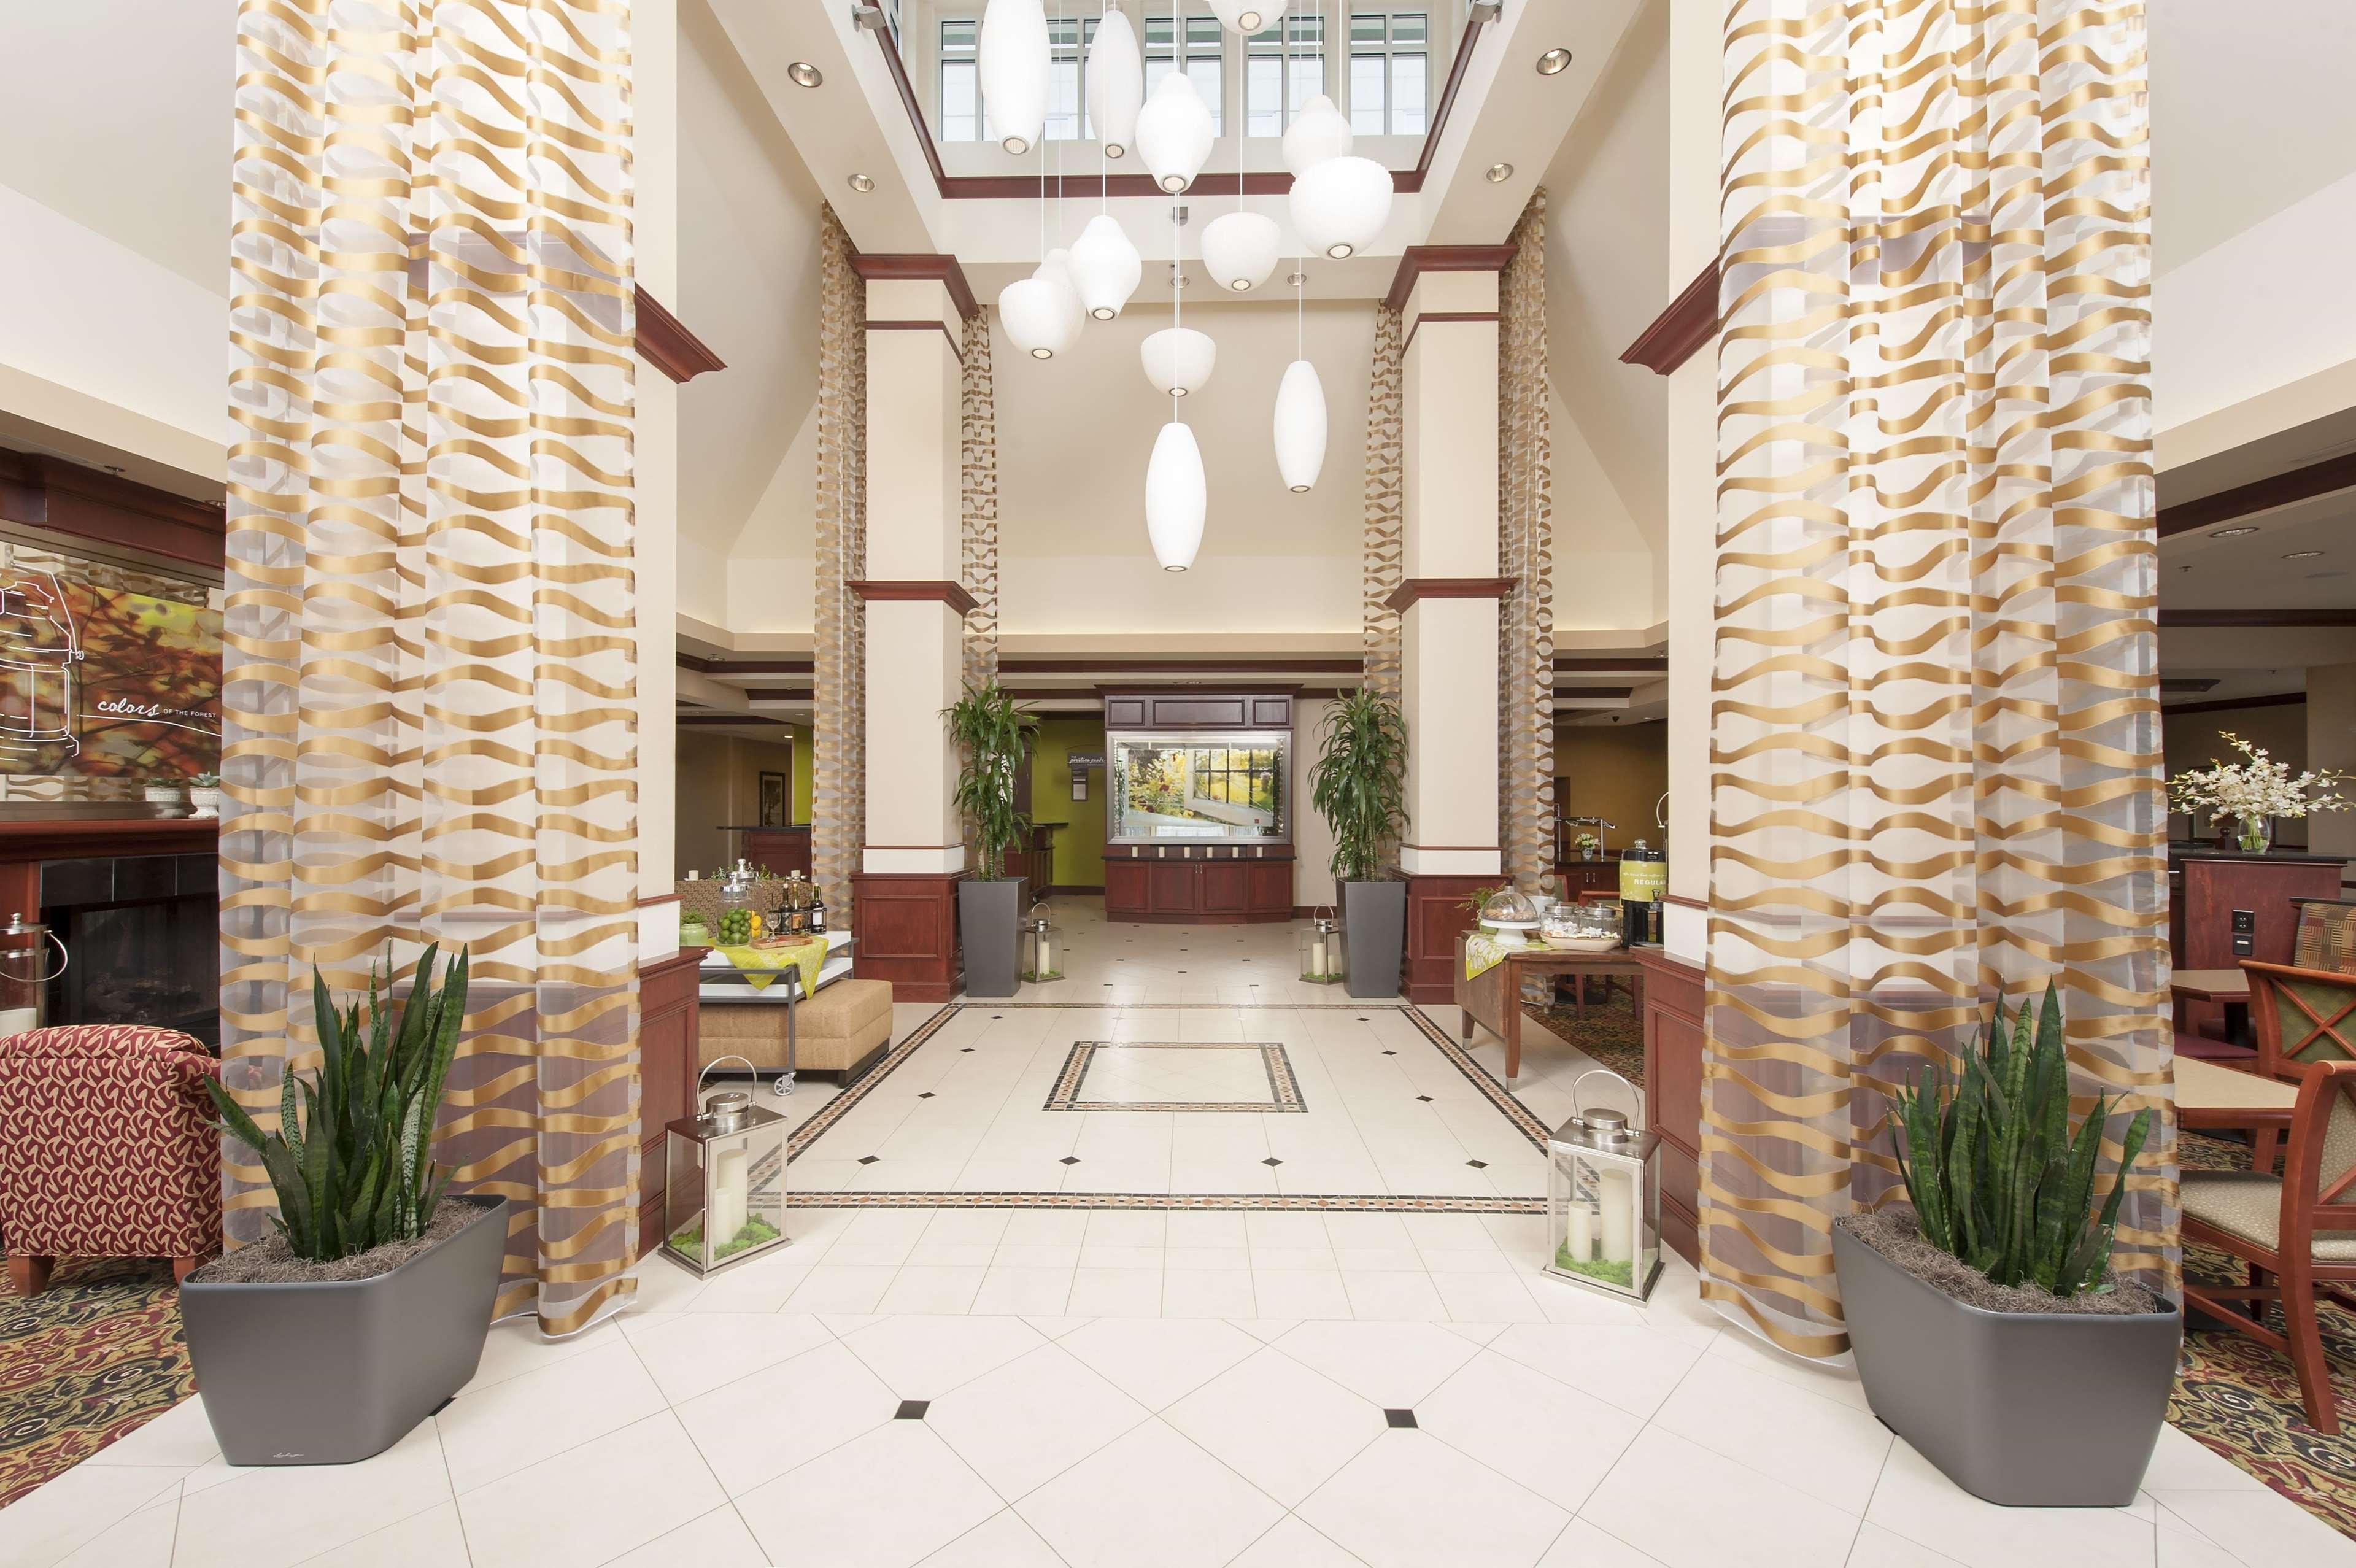 Hilton Garden Inn Indianapolis Airport image 0